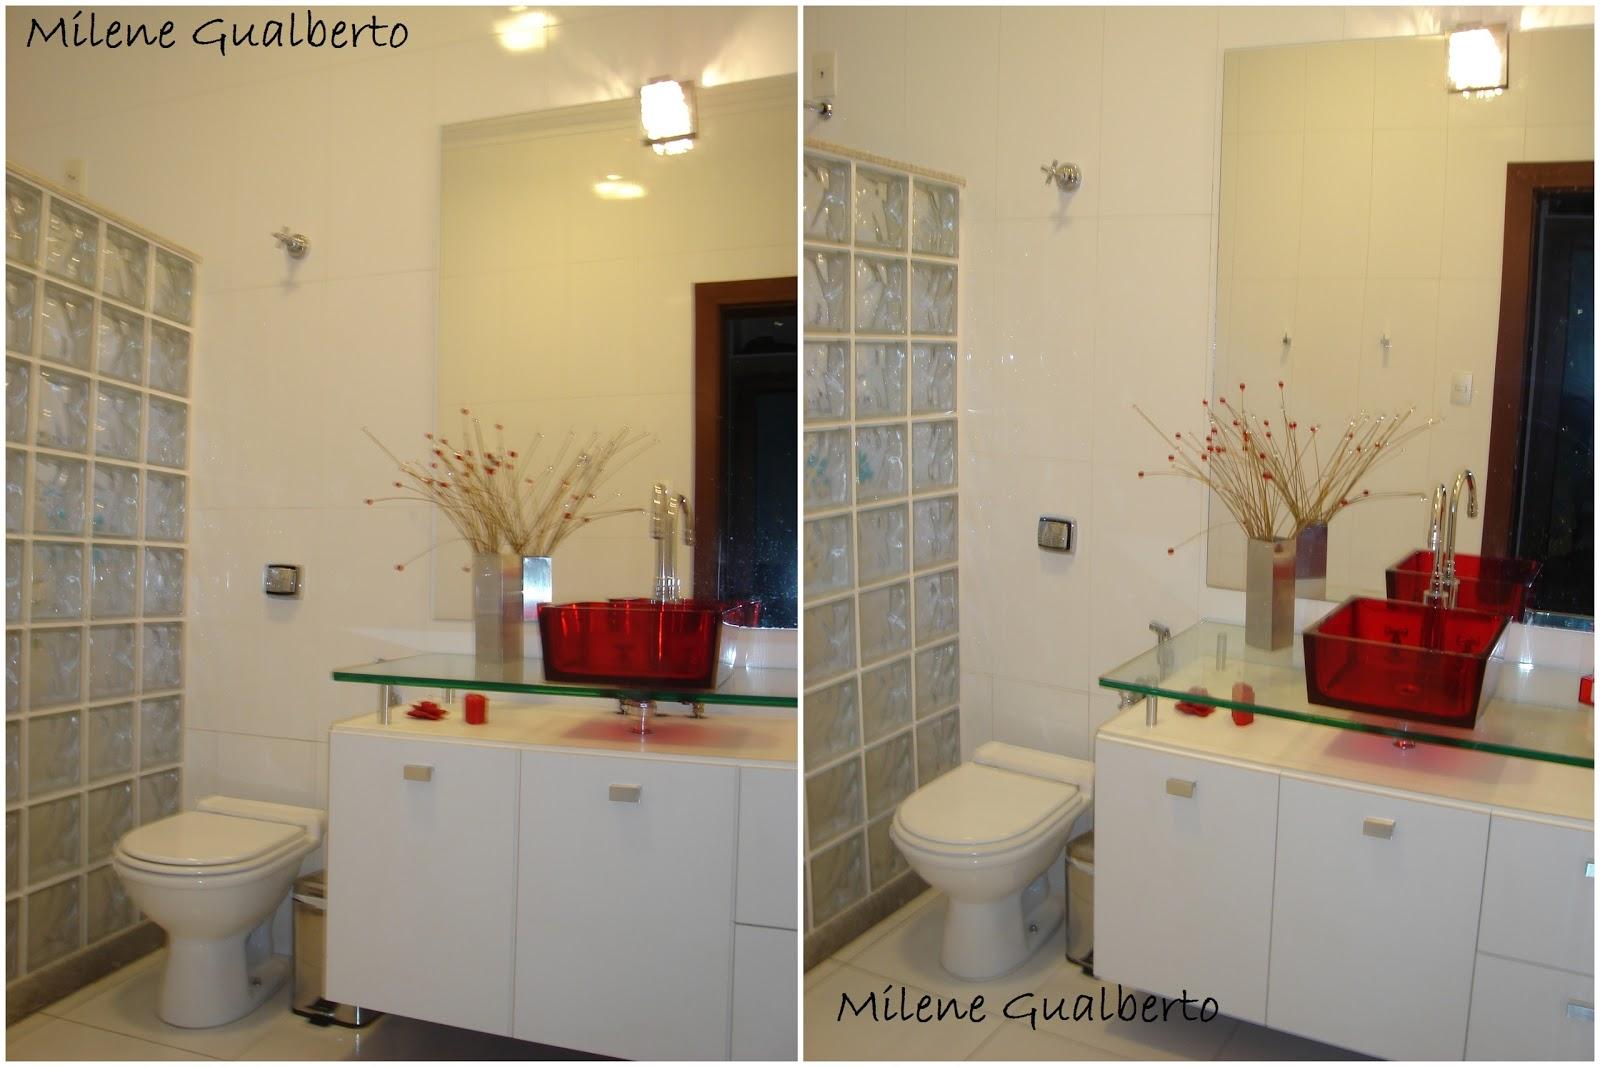 Banheiros Pequenos Com Tijolos De Vidro  homefiresafetykitcom banheiros com # Banheiro Decorado Com Tijolos De Vidro